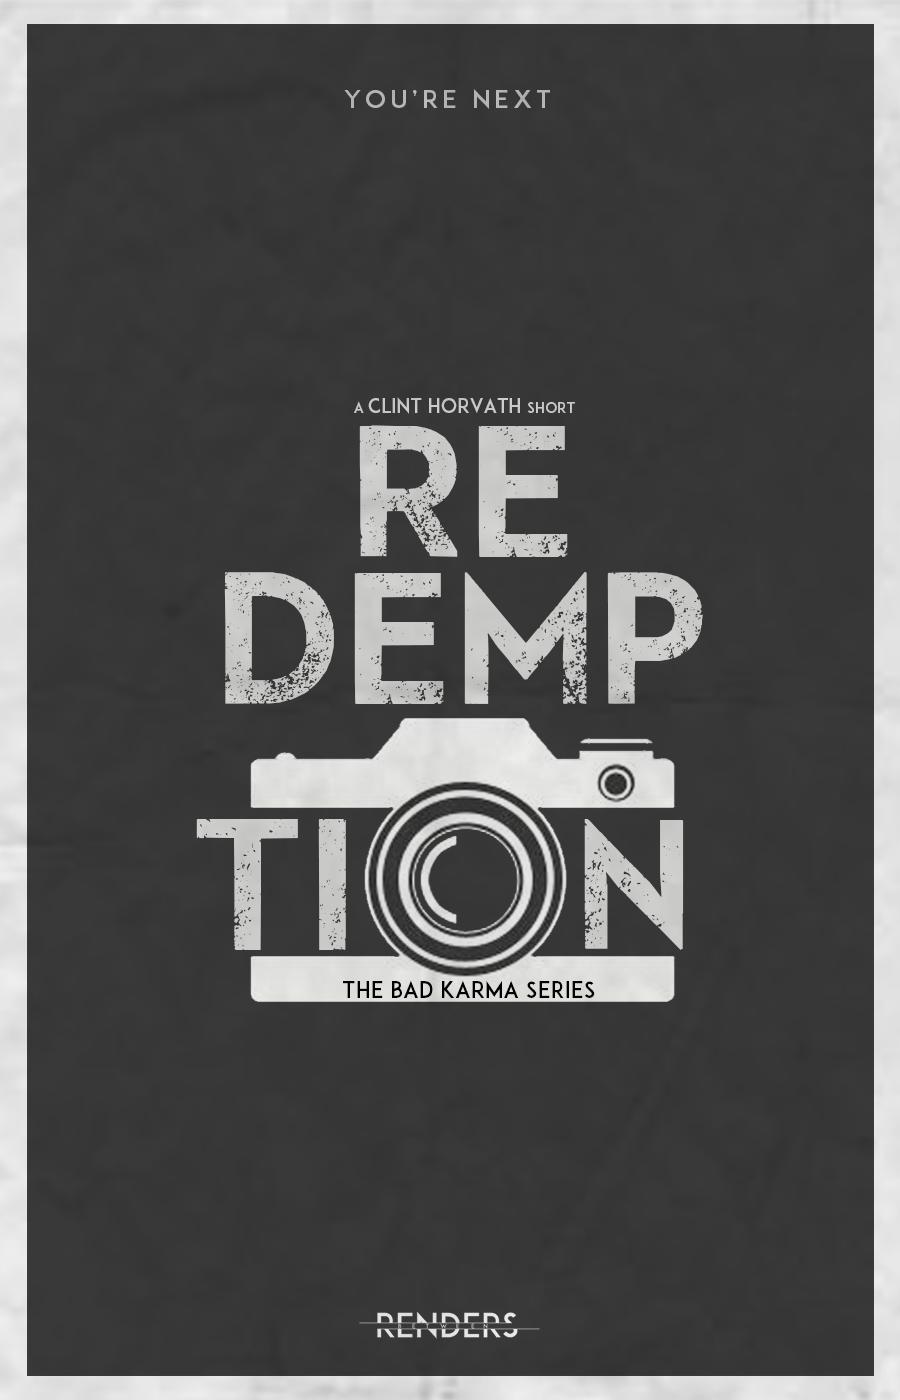 Minimalist Movie Poster - Redemption by chorvath8